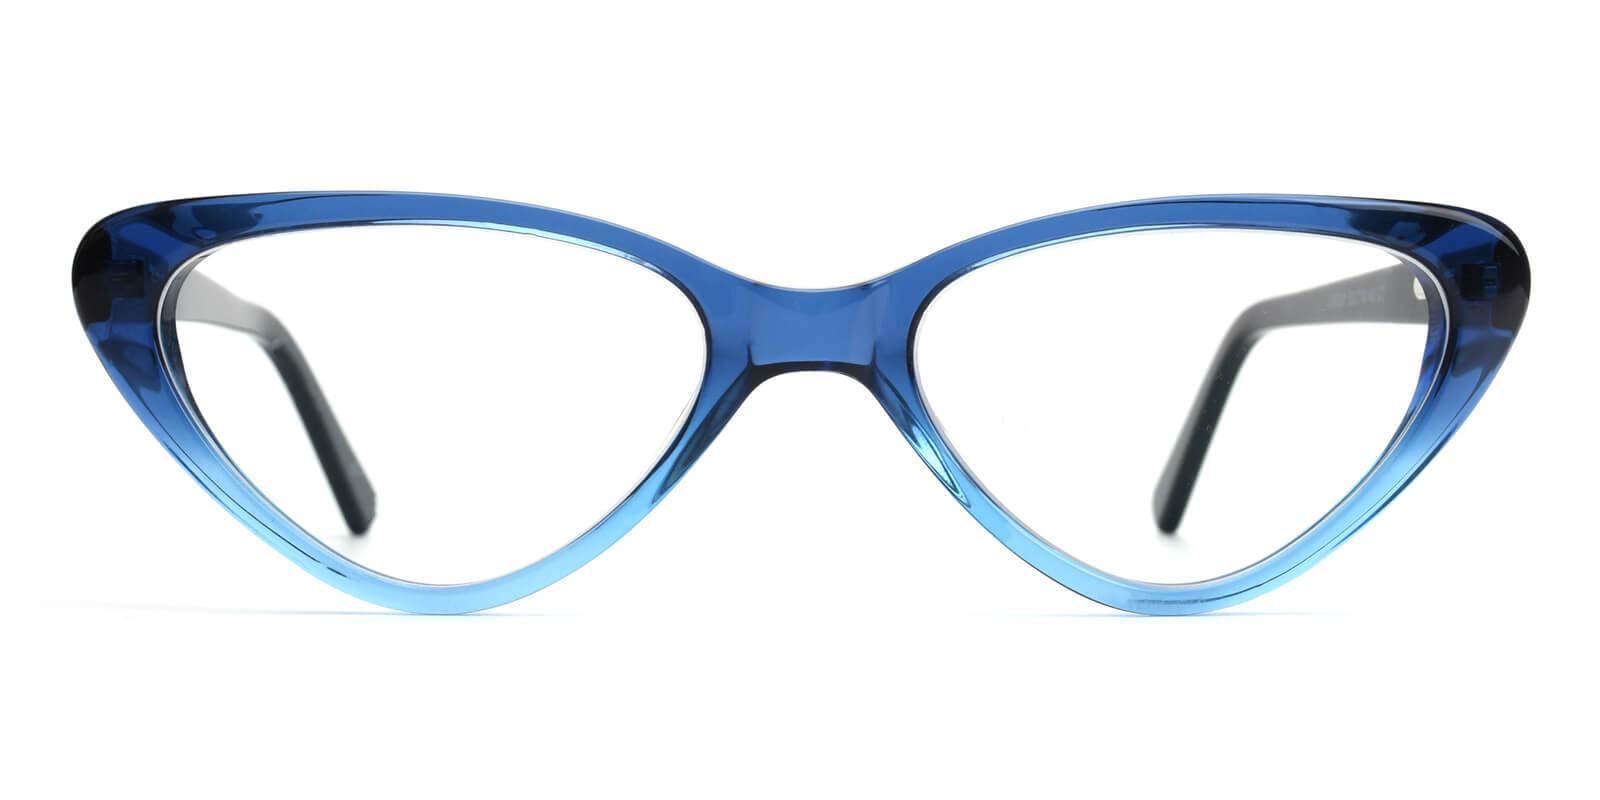 Catalin-Blue-Cat-Acetate-Eyeglasses-detail